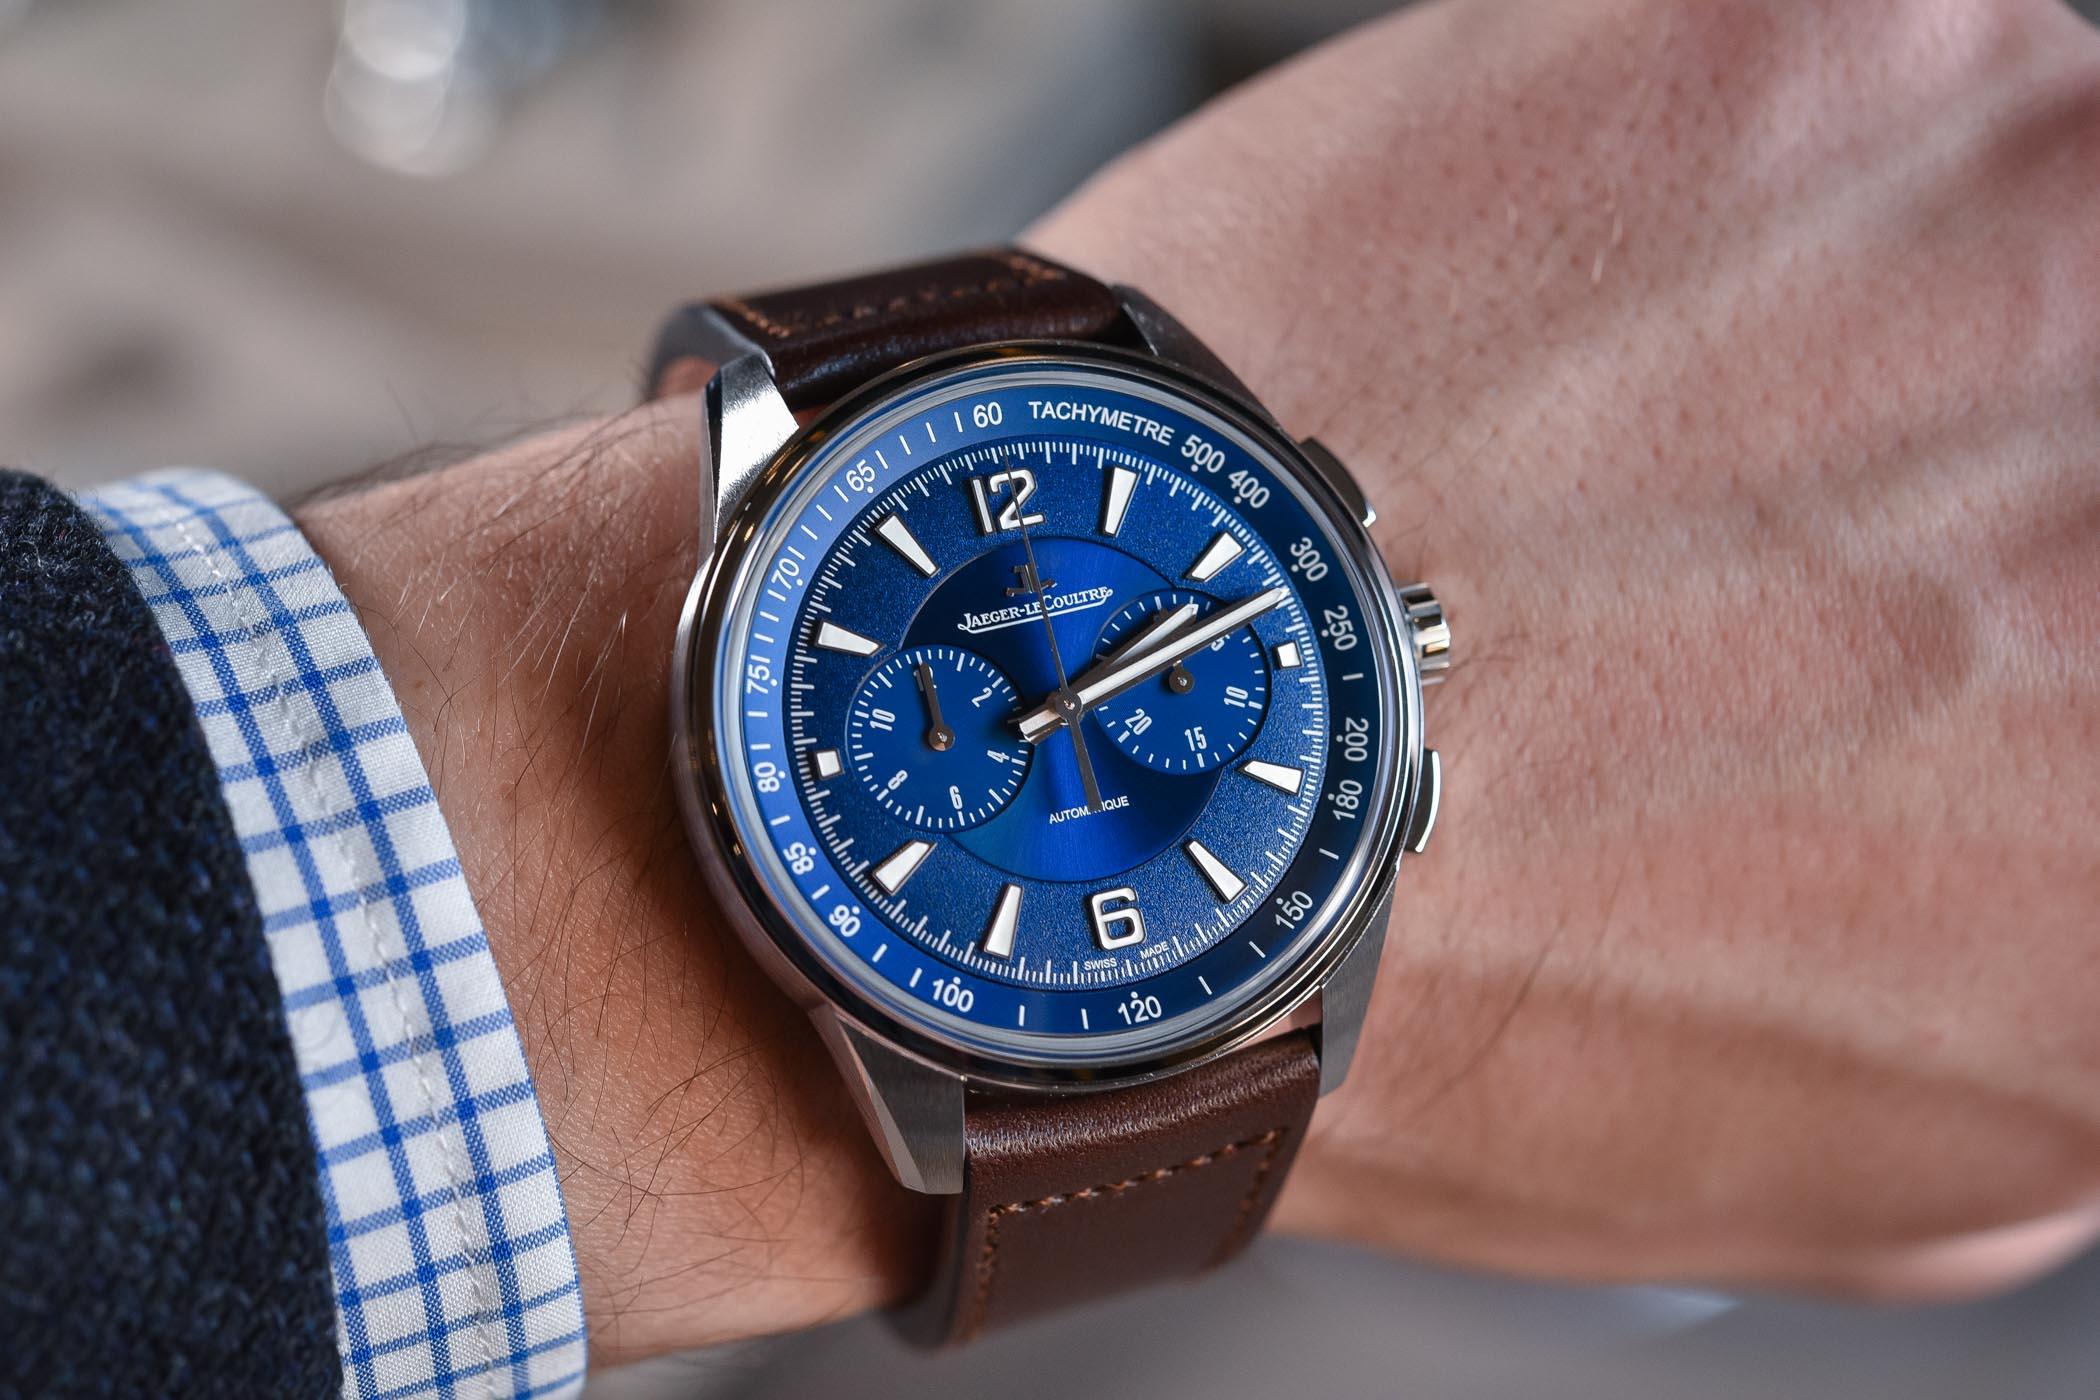 Jaeger-LeCoultre Polaris Chronograph Blue dial 9028480